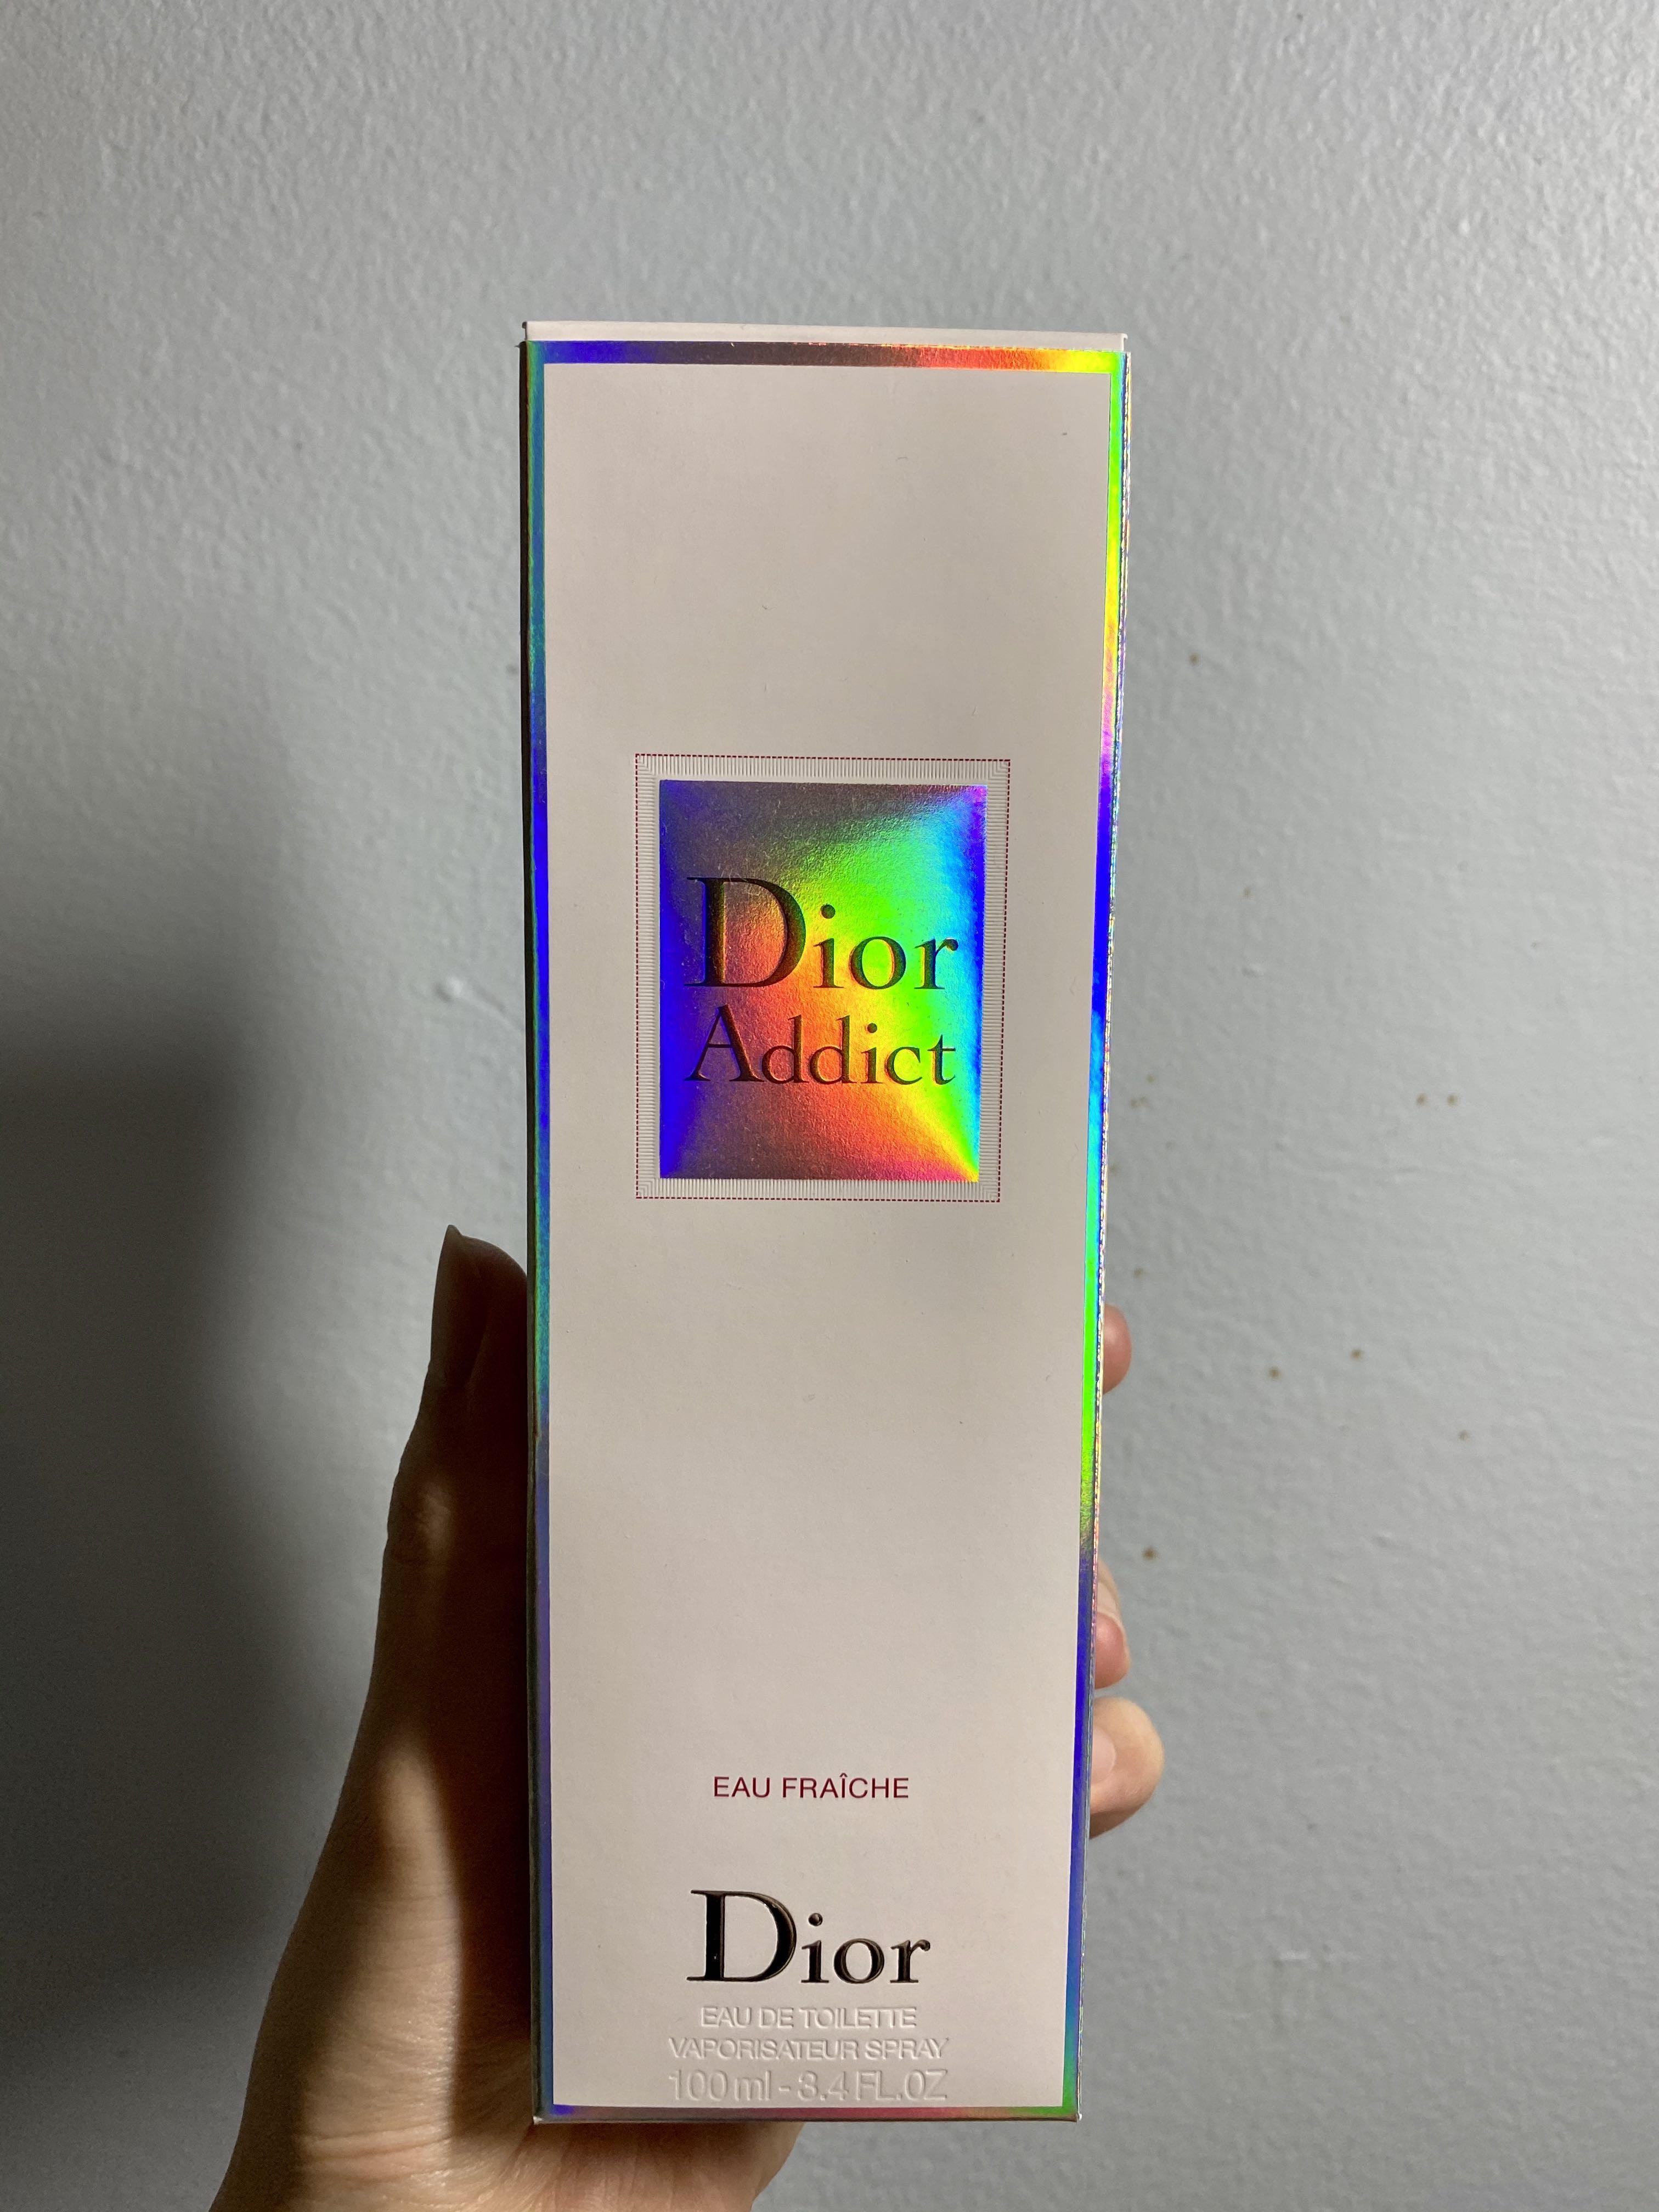 Dior Addict Eau Fraîche Perfume